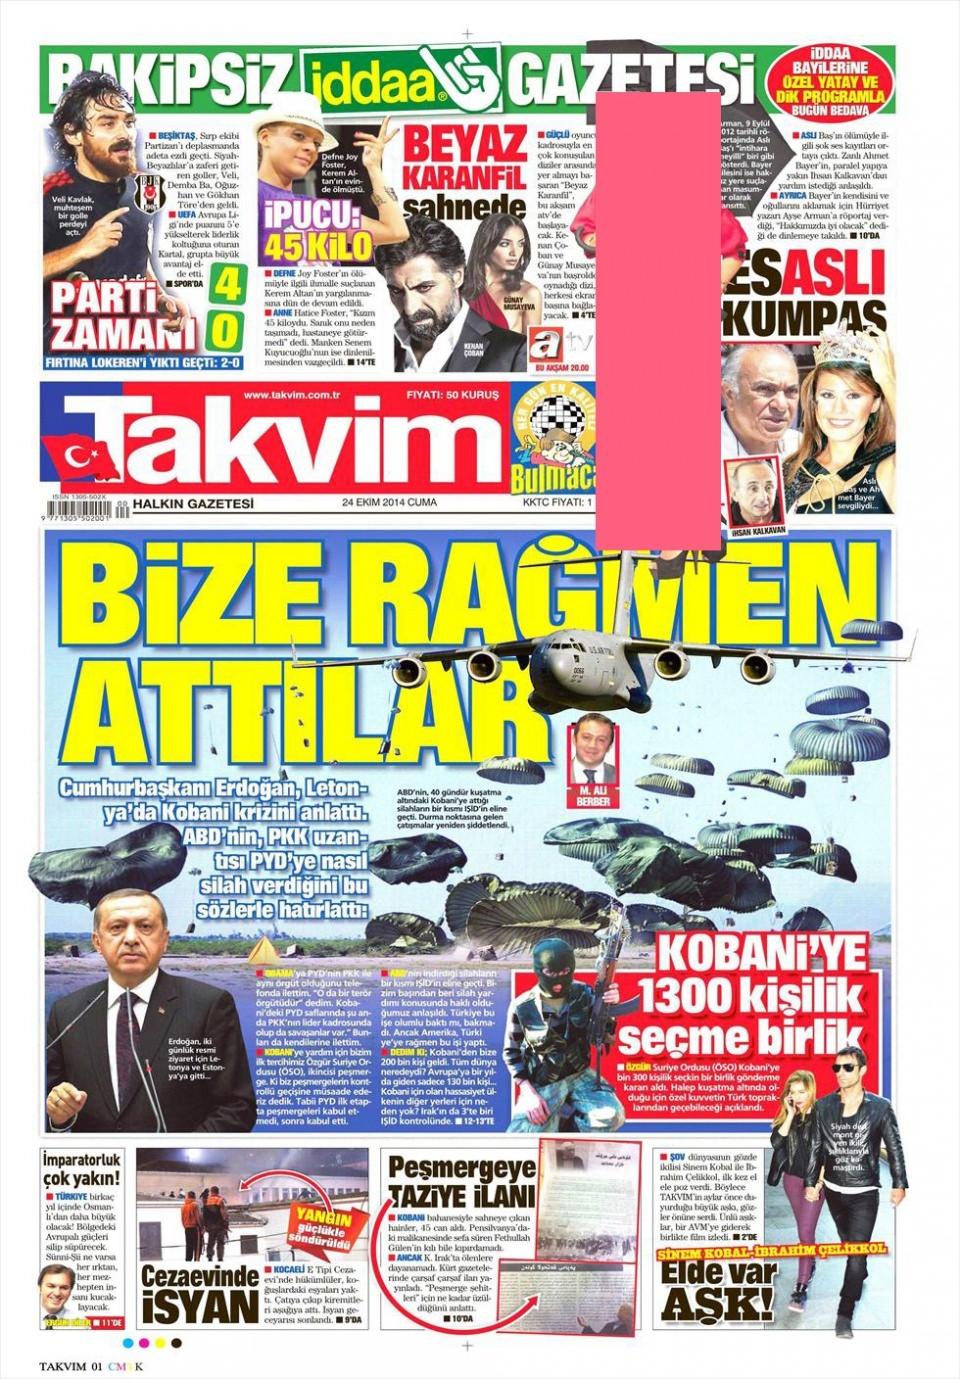 24 Ekim 2014 gazete manşetleri 18